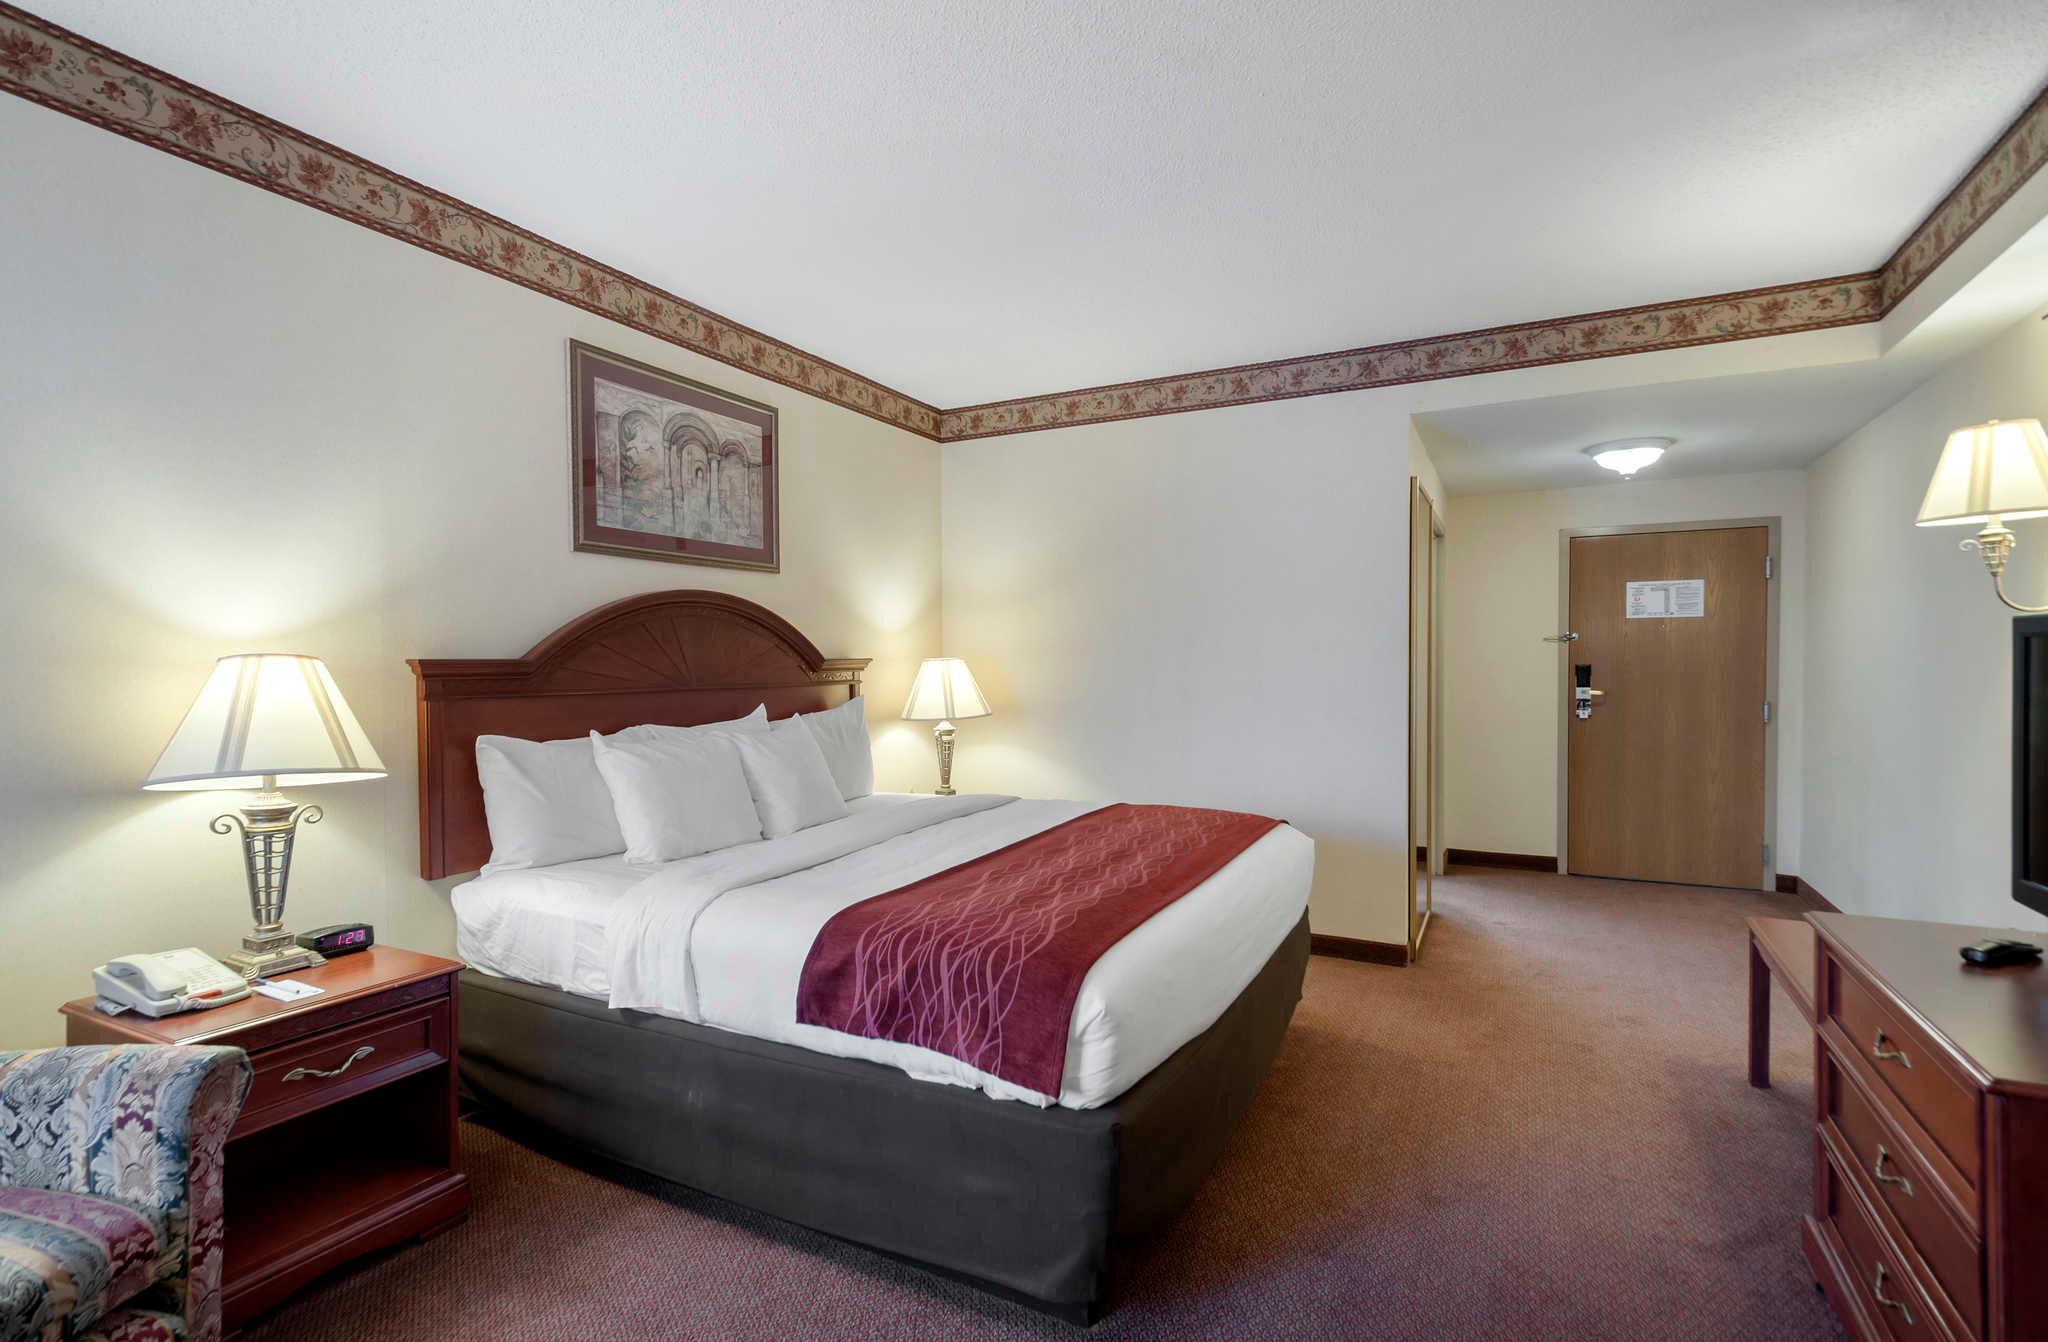 Comfort Inn & Suites Edgewood - Aberdeen image 12